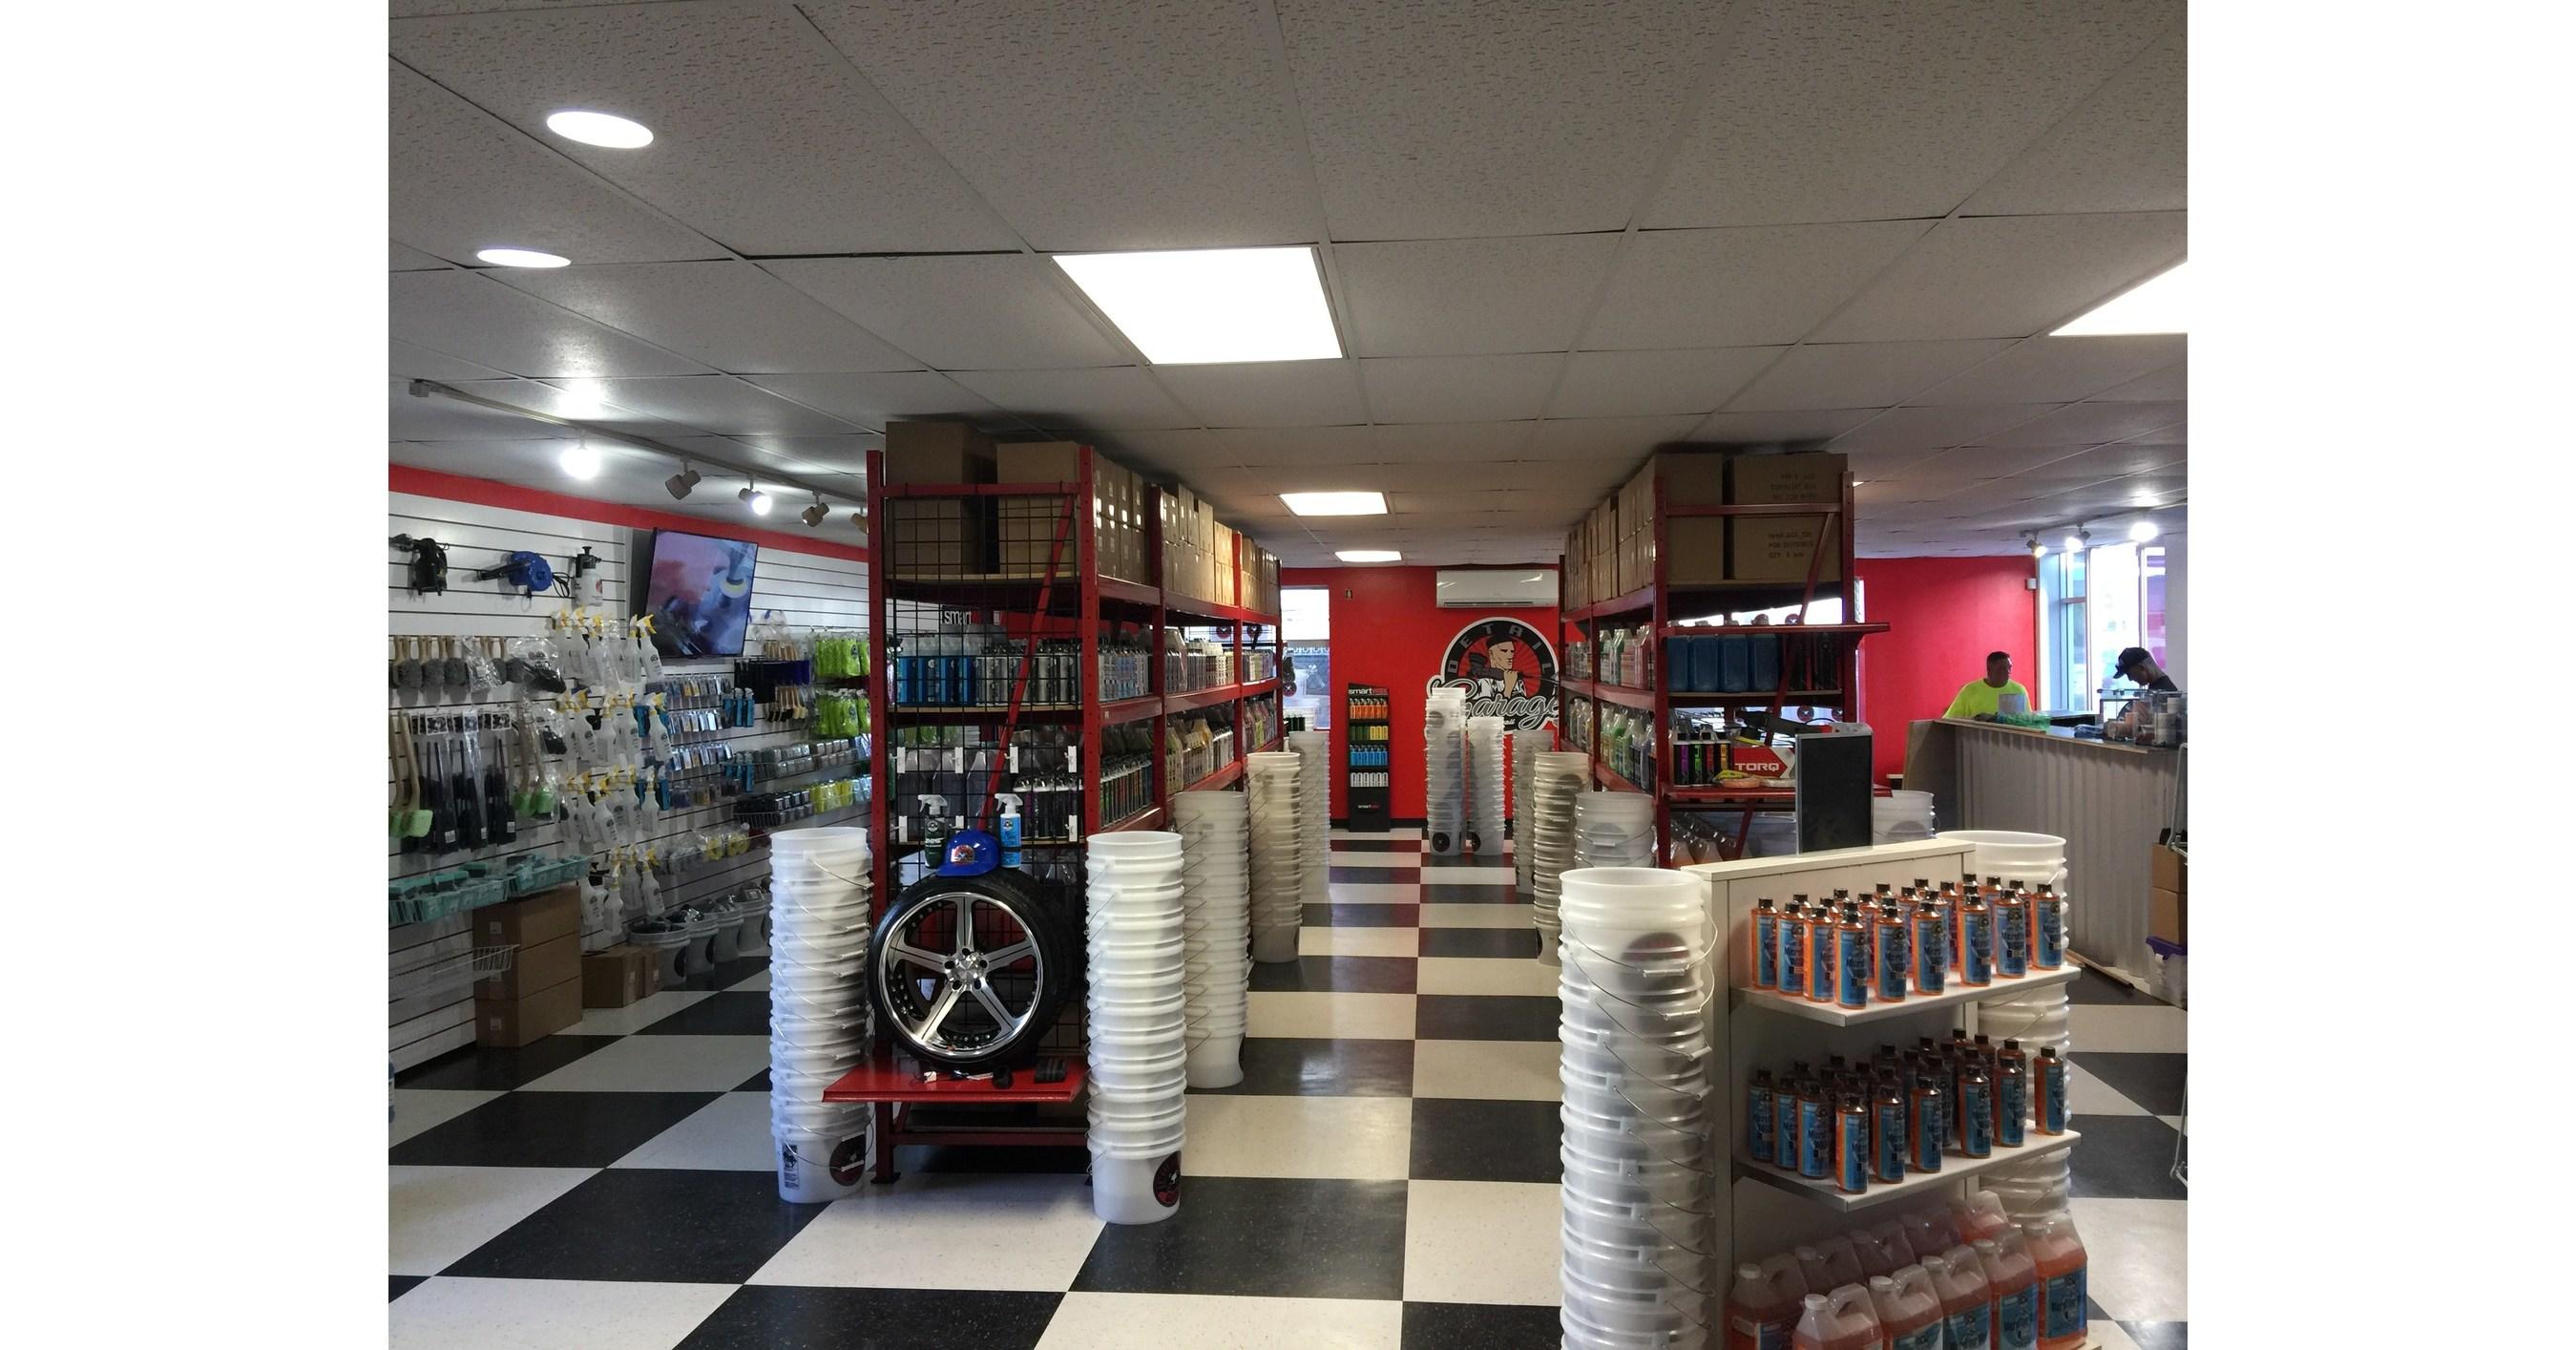 Detail garage franchise announces new location in hawaii for Garage sans franchise